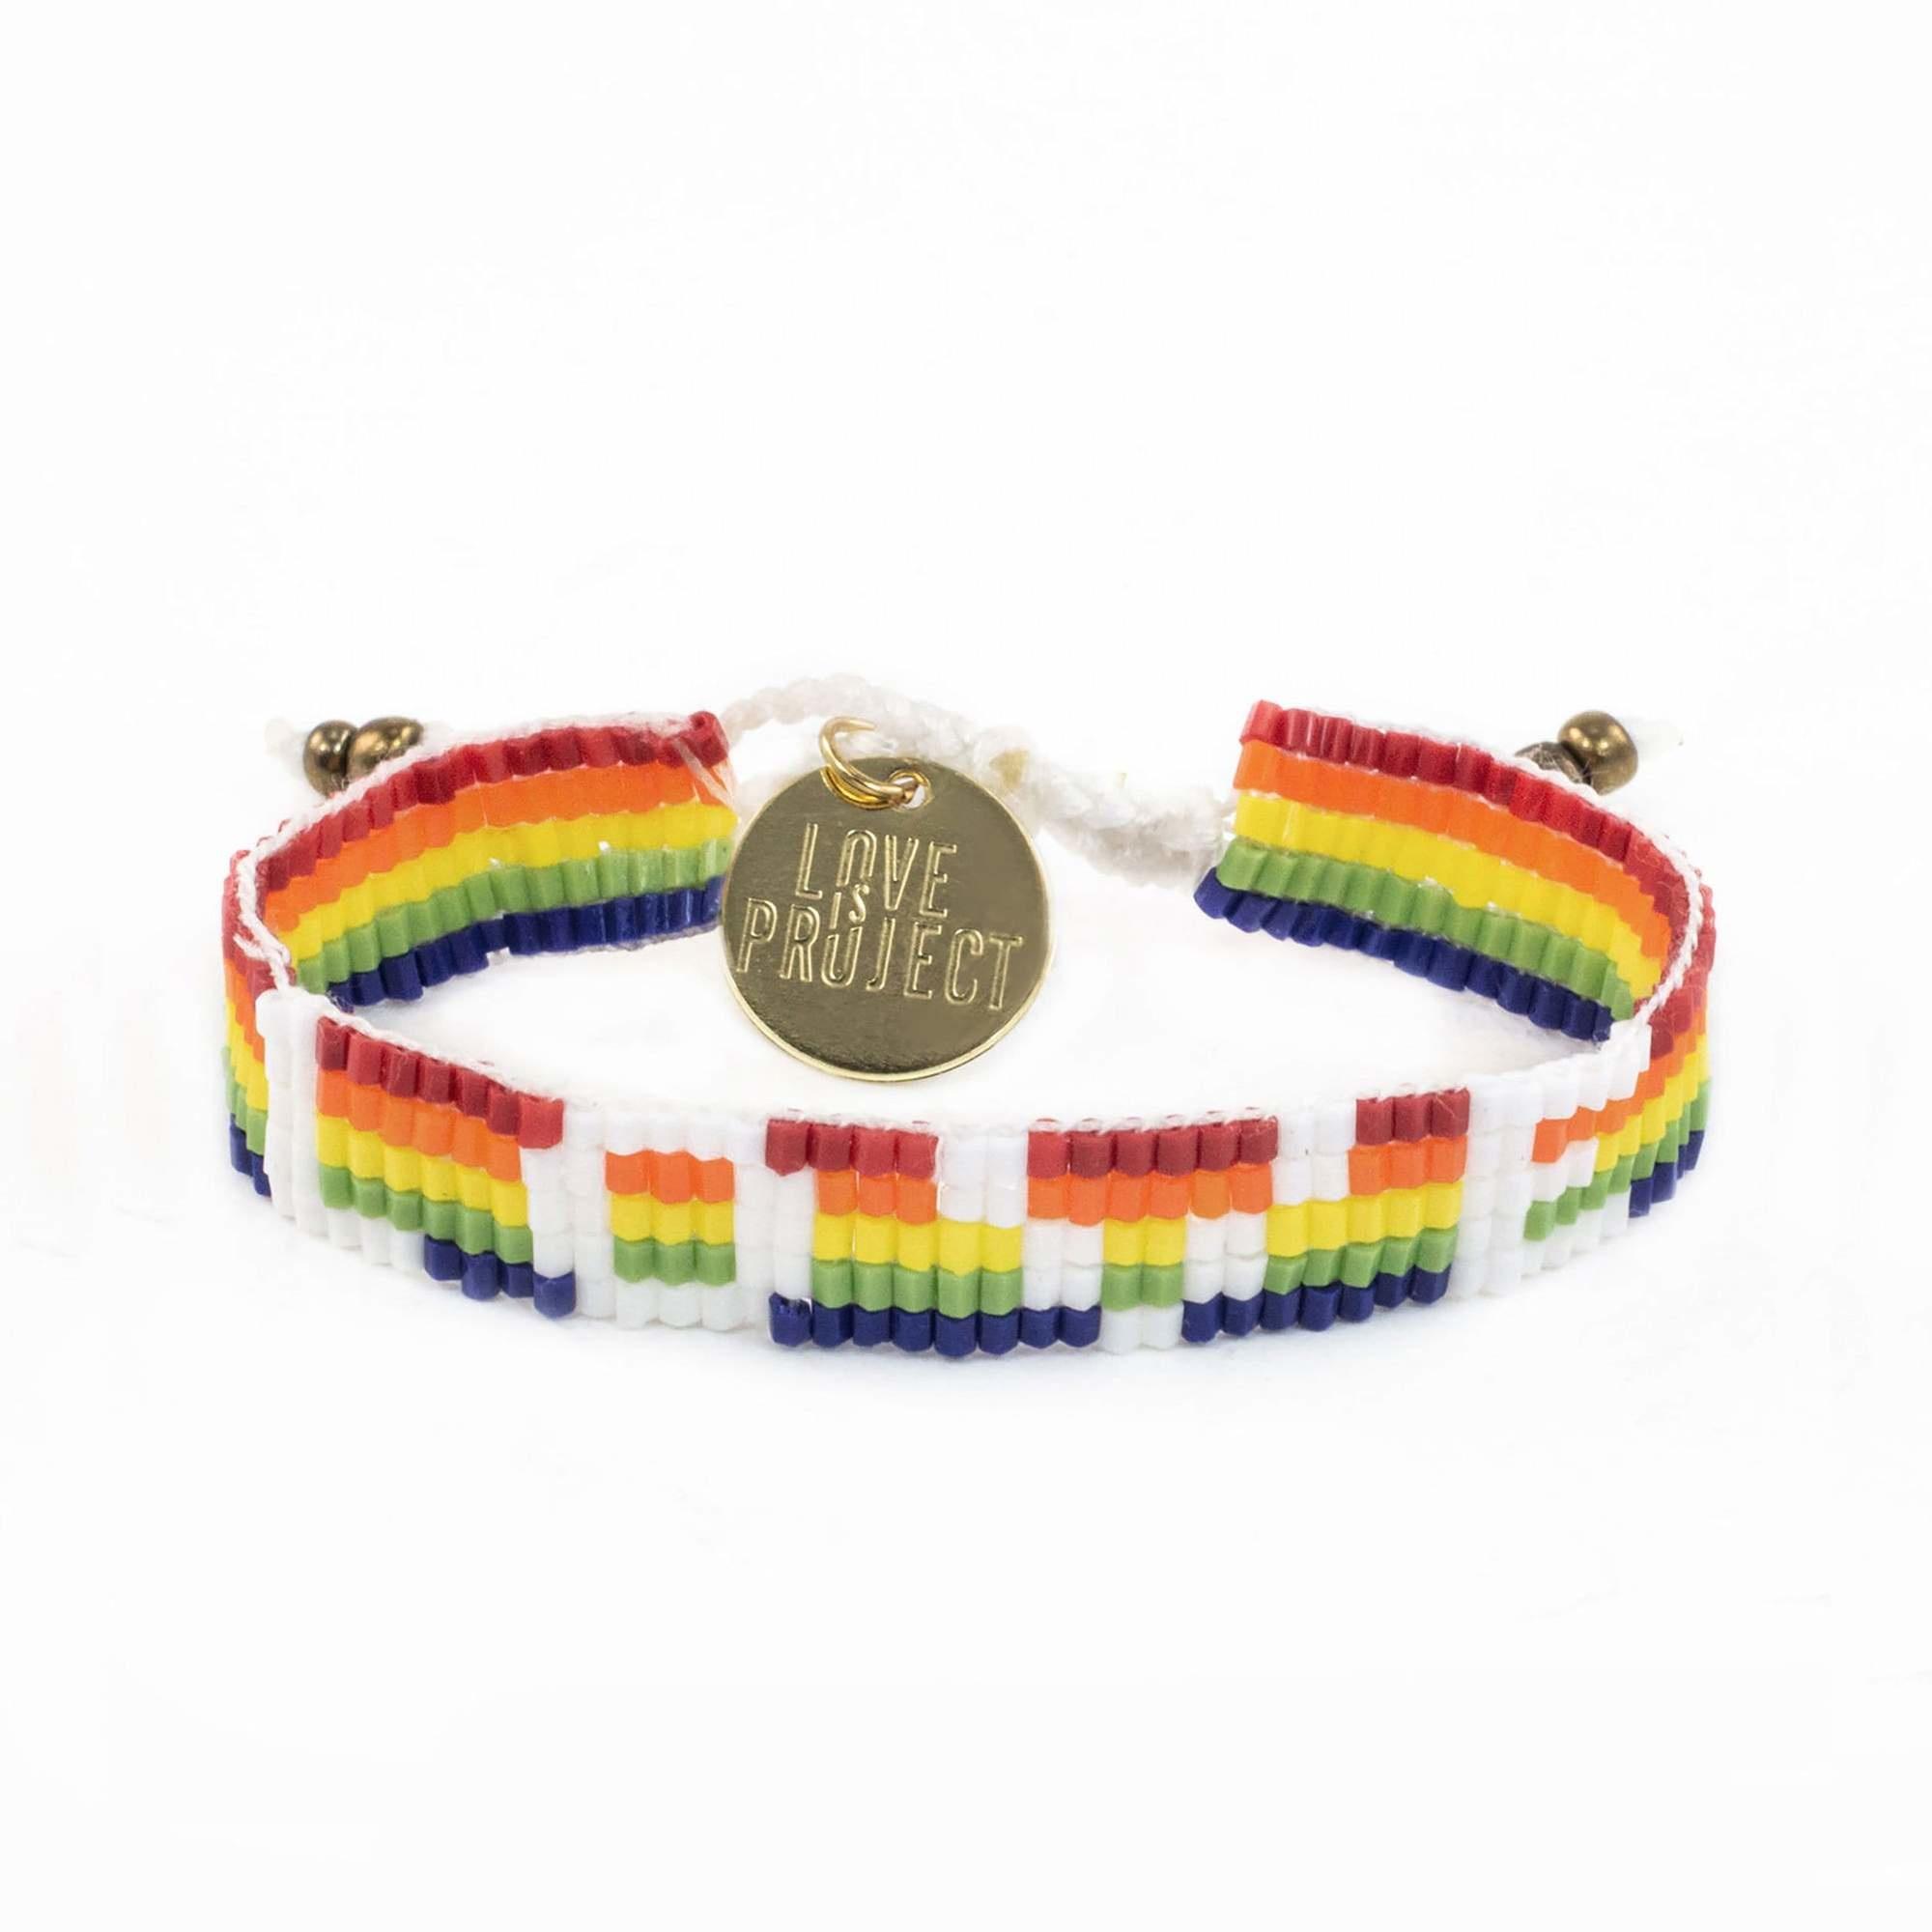 Love Project Seed Bead LOVE Bracelet - Rainbow